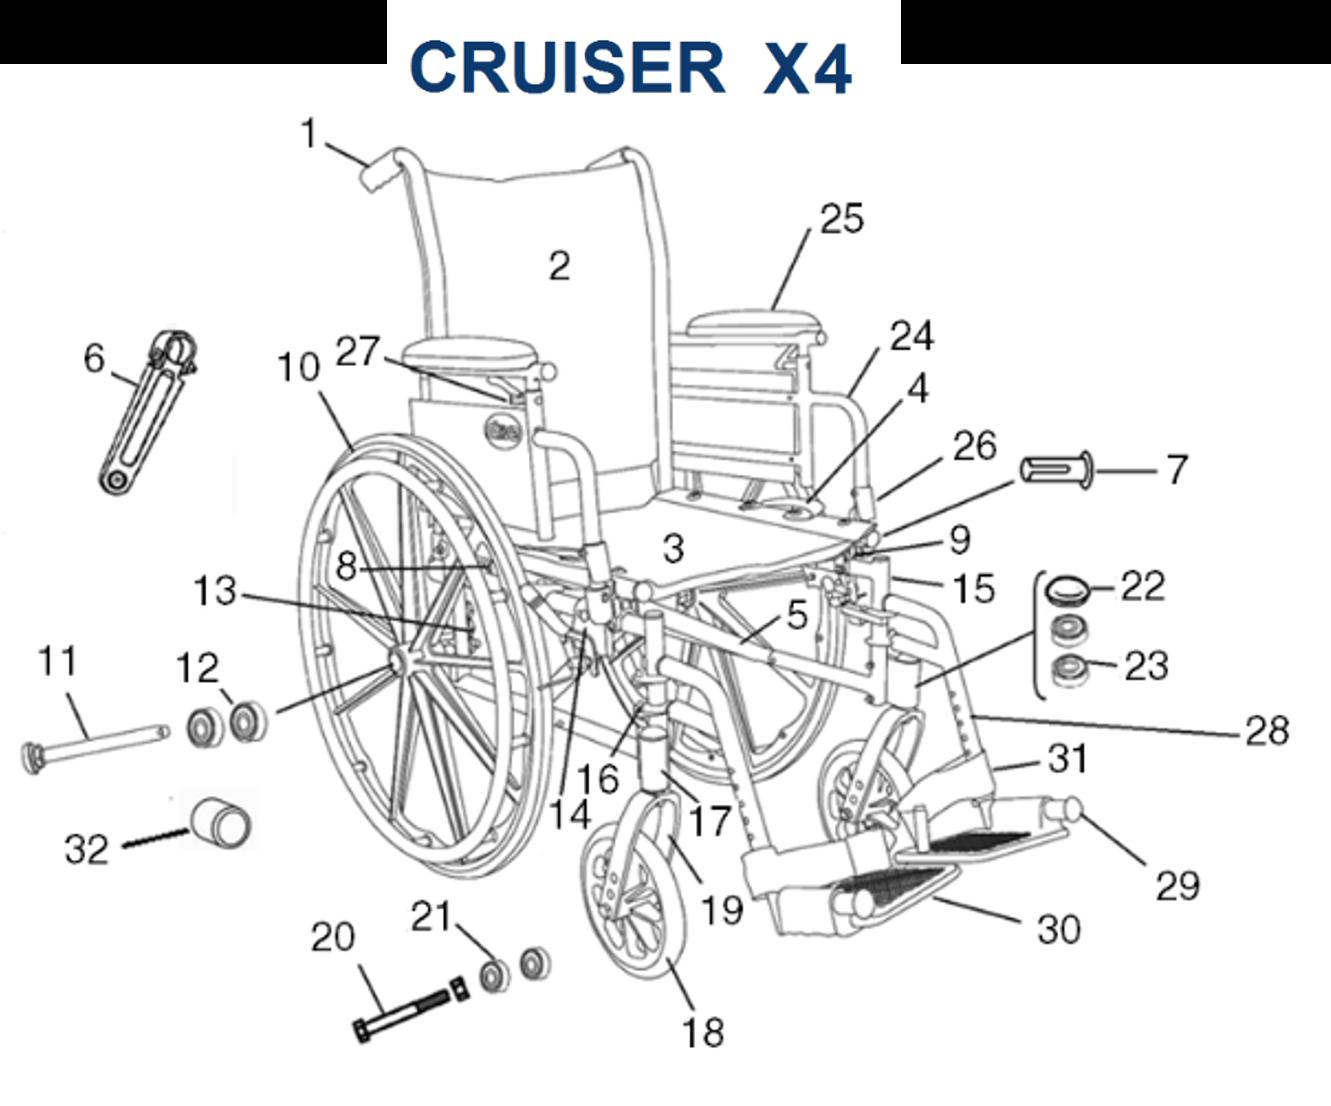 cruiser-x4-2.png